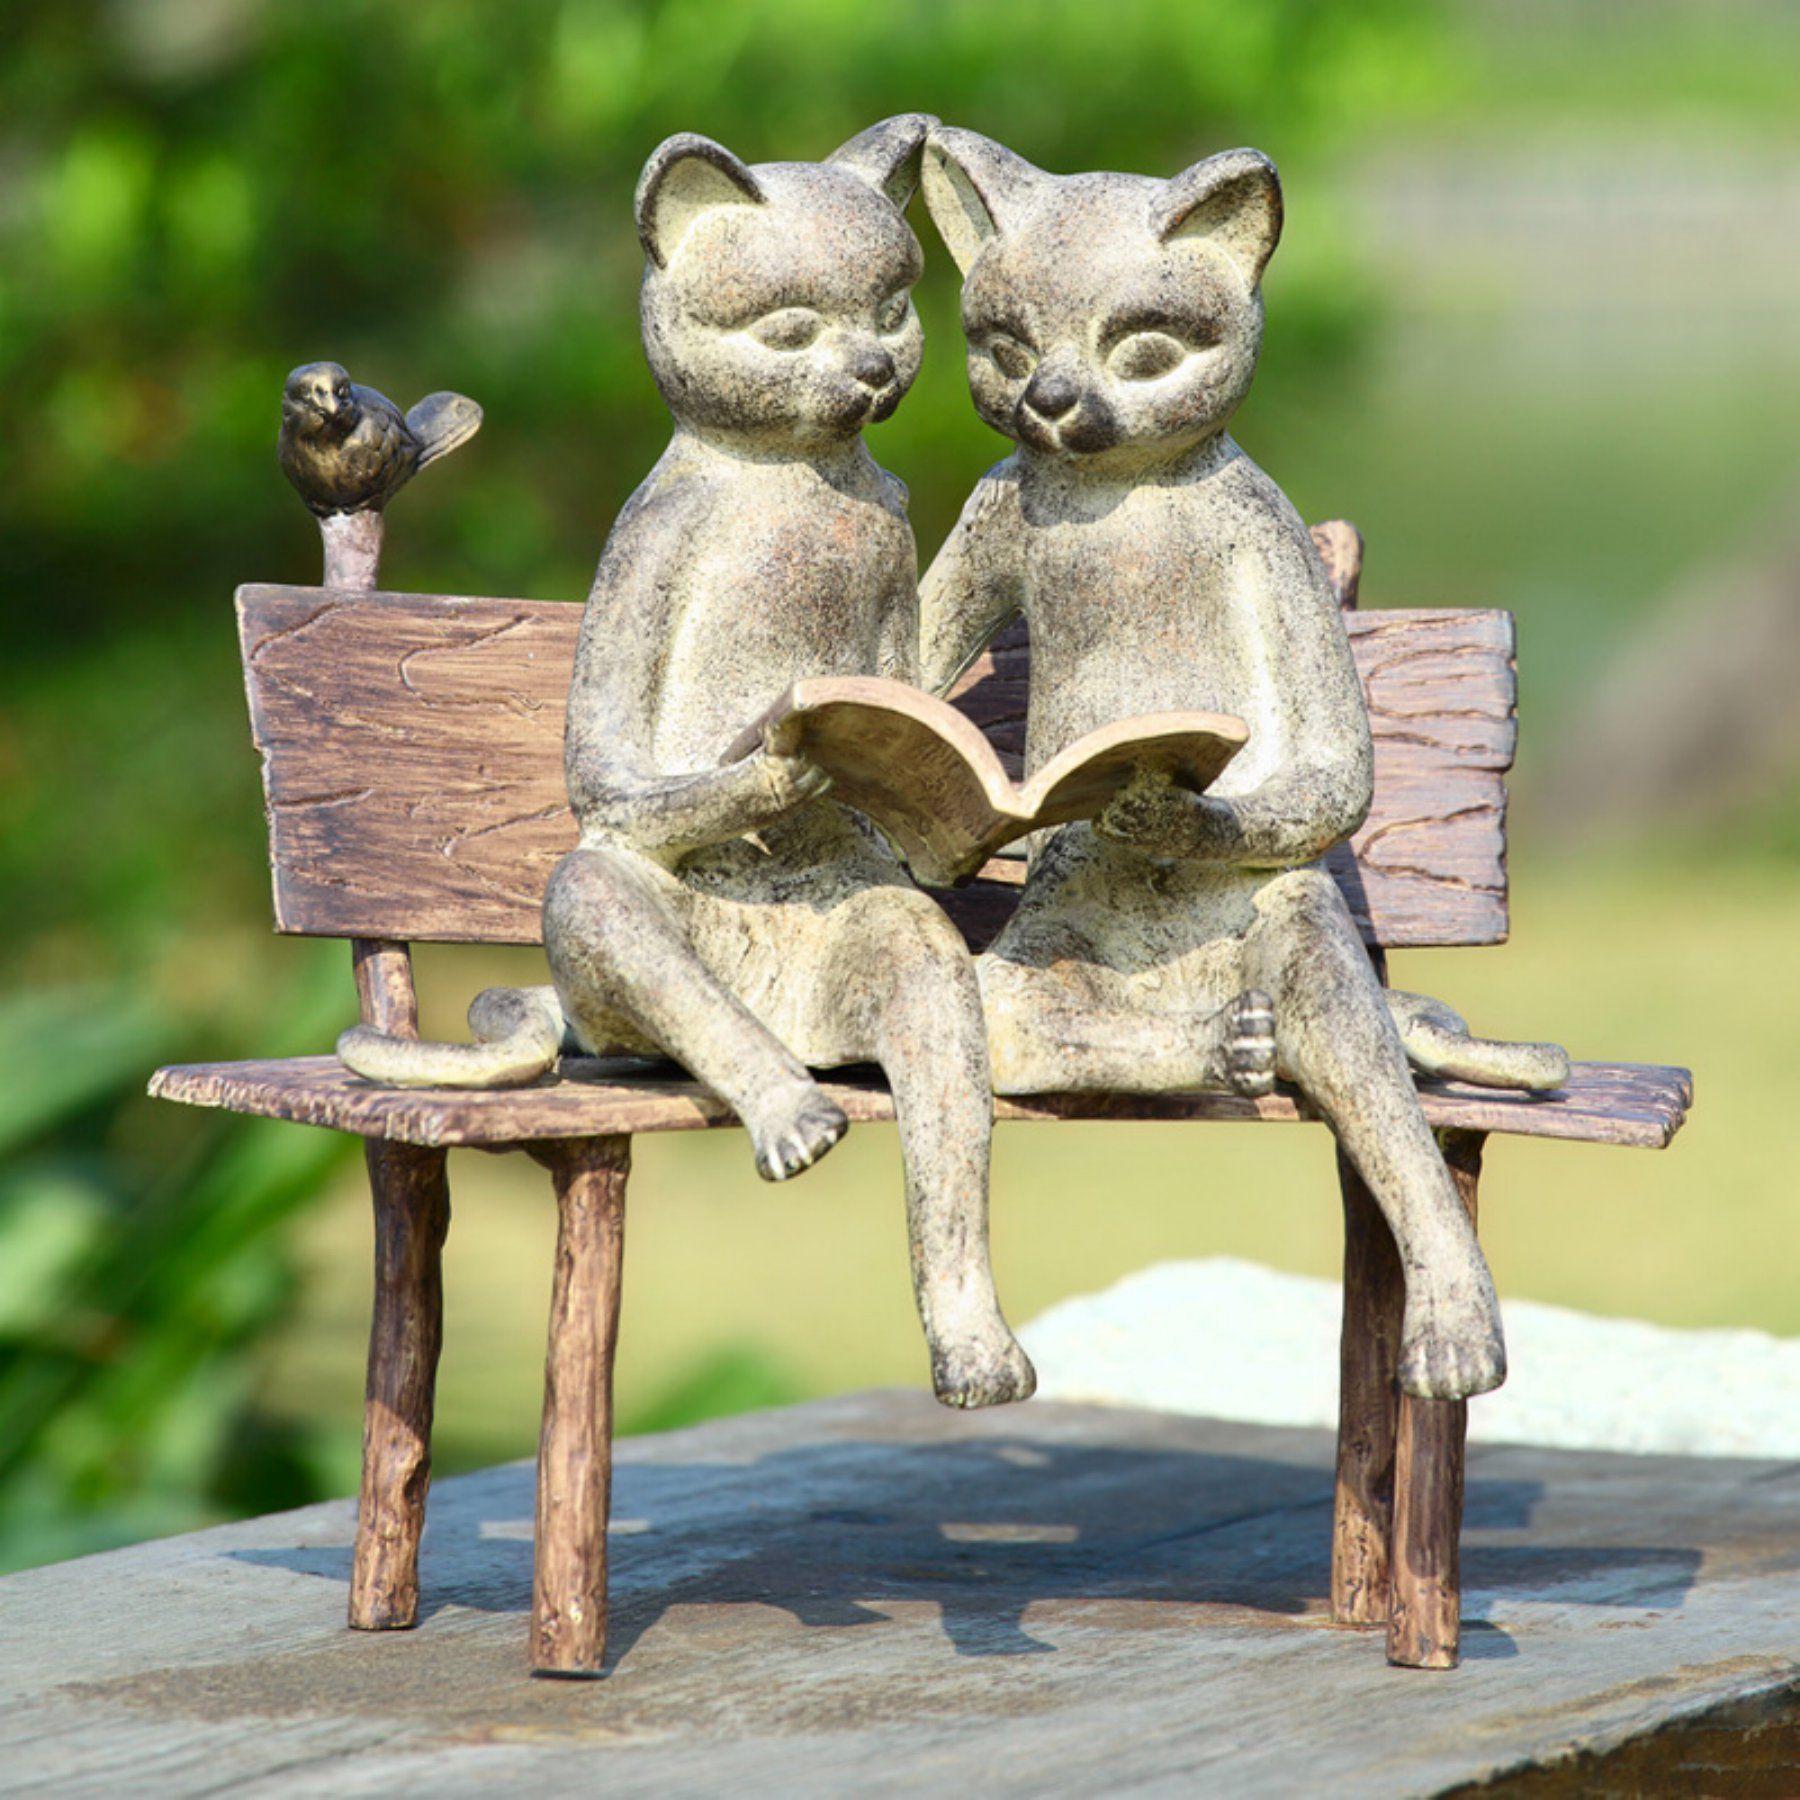 Literary Cat Book Lover Reading Garden Sculpture Statue Whimsical SPI Home 33651